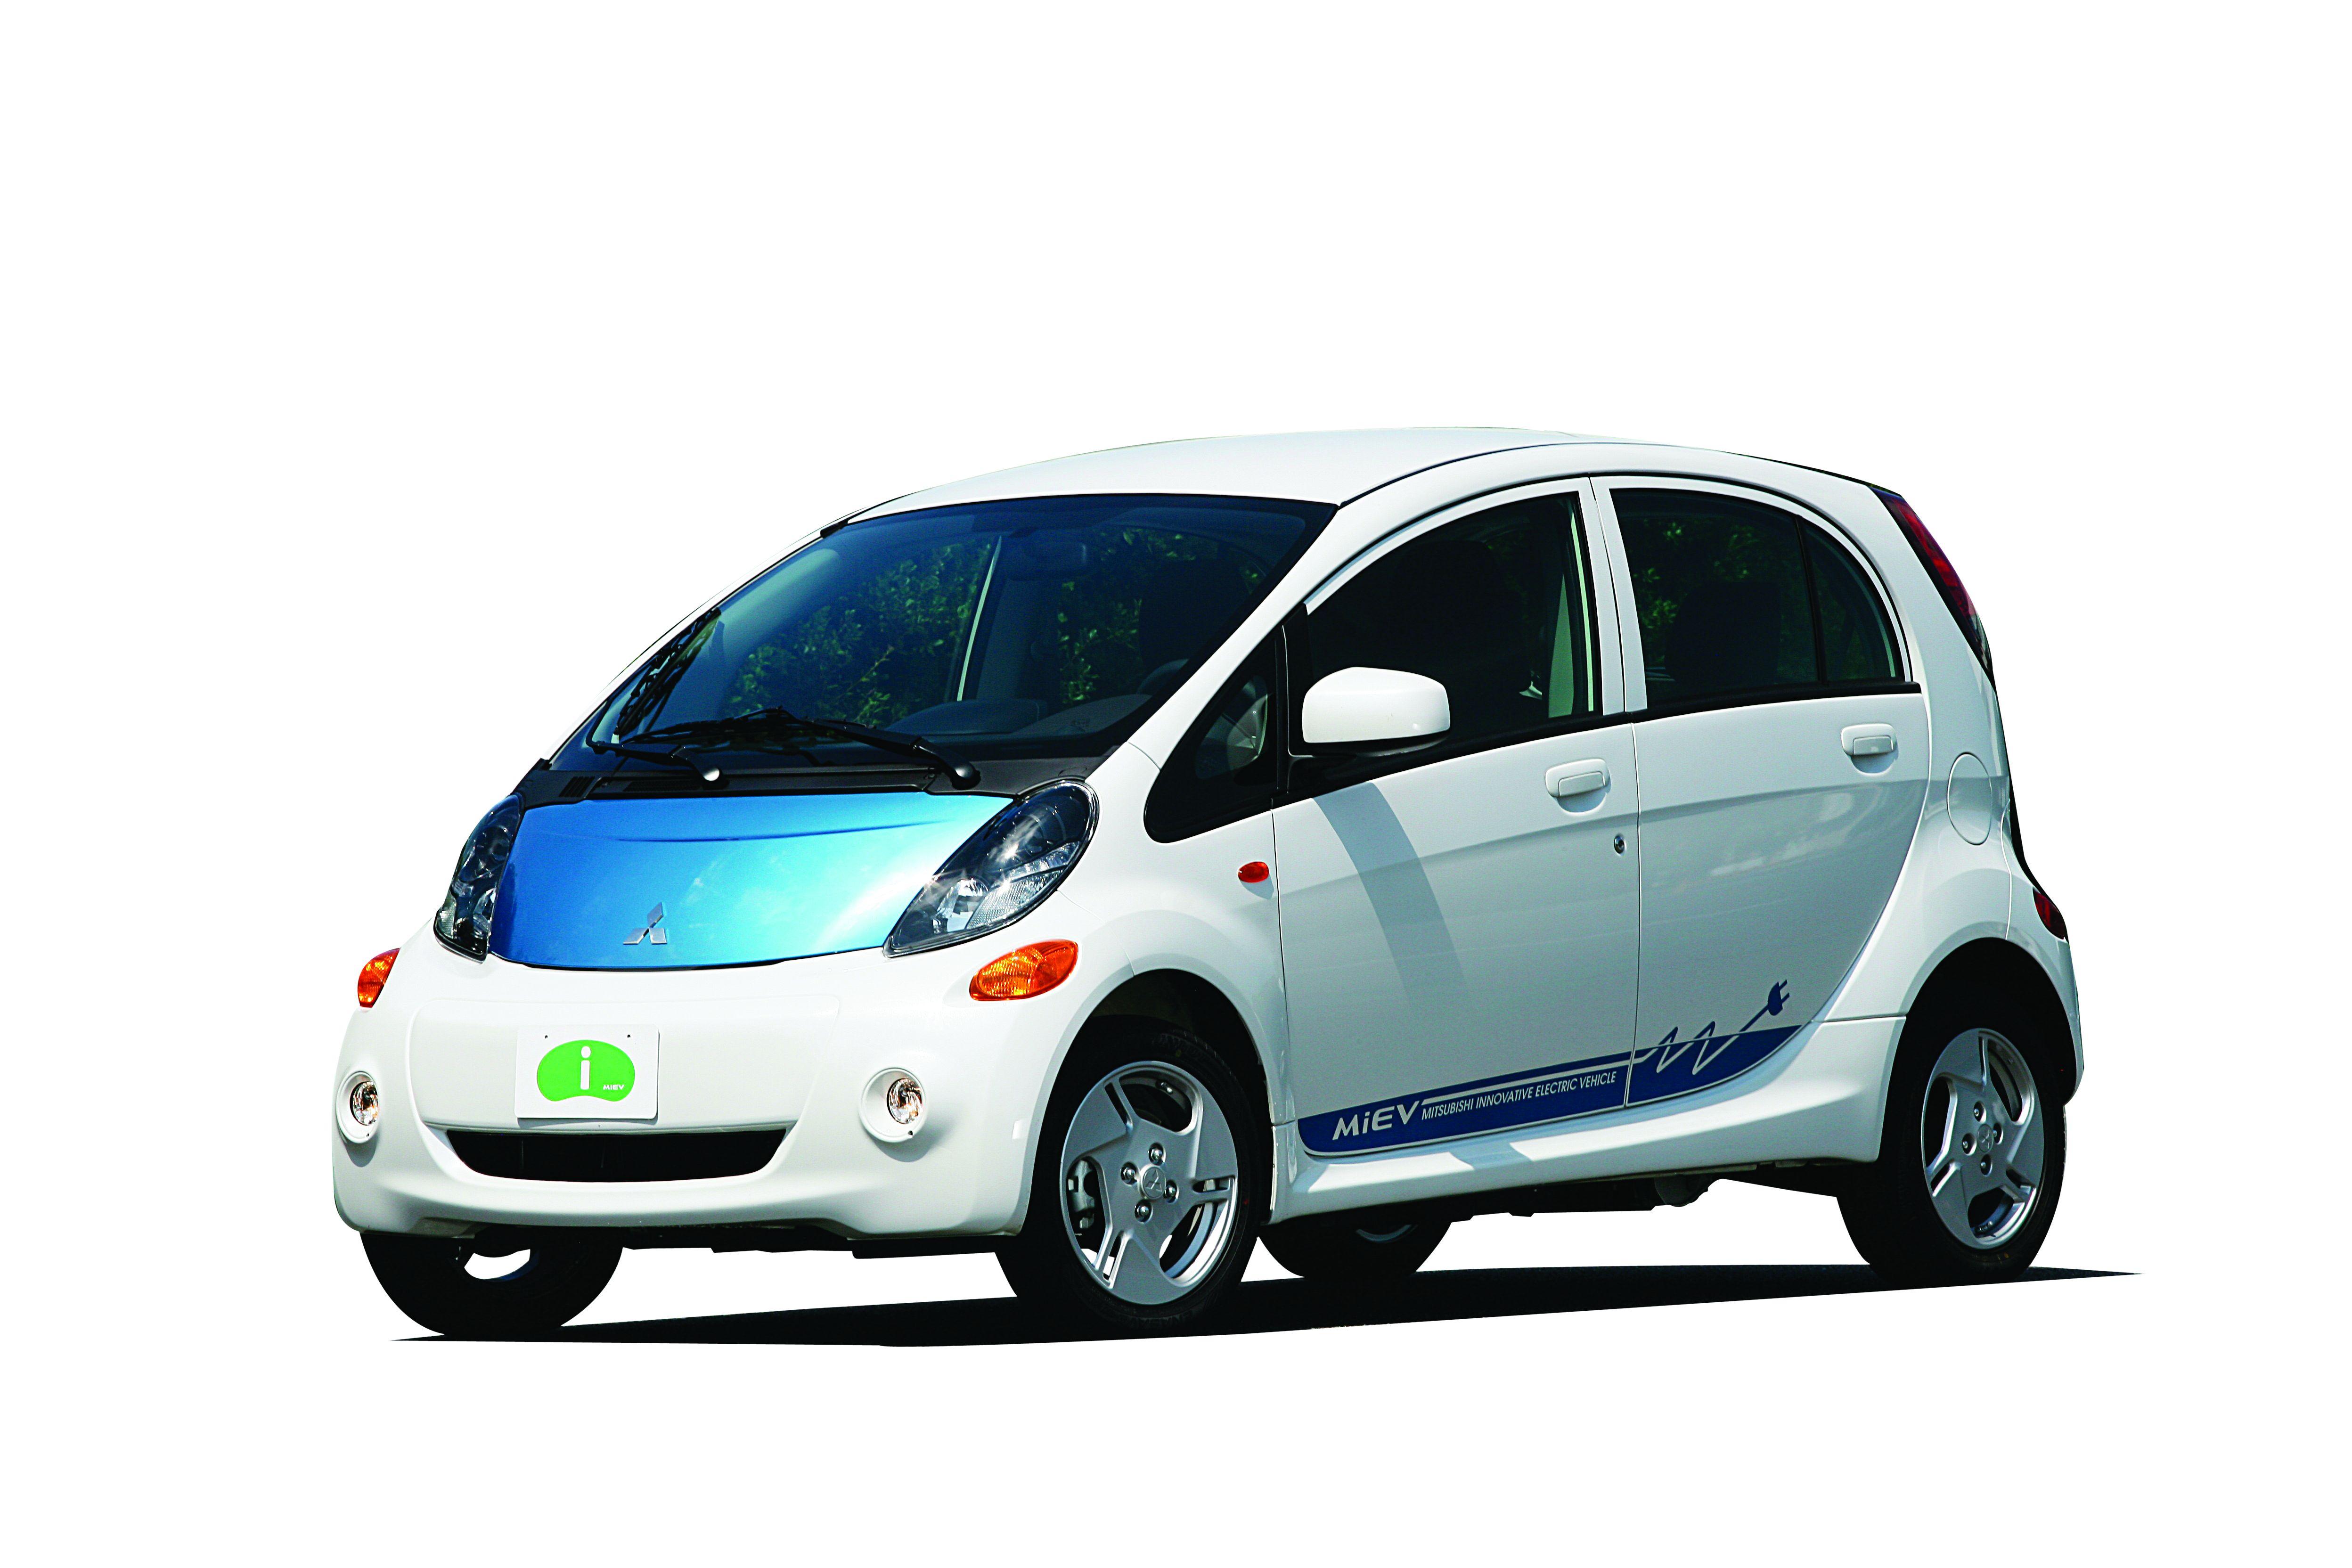 Mitsubishi's 'i-Catching' Electric Vehicle